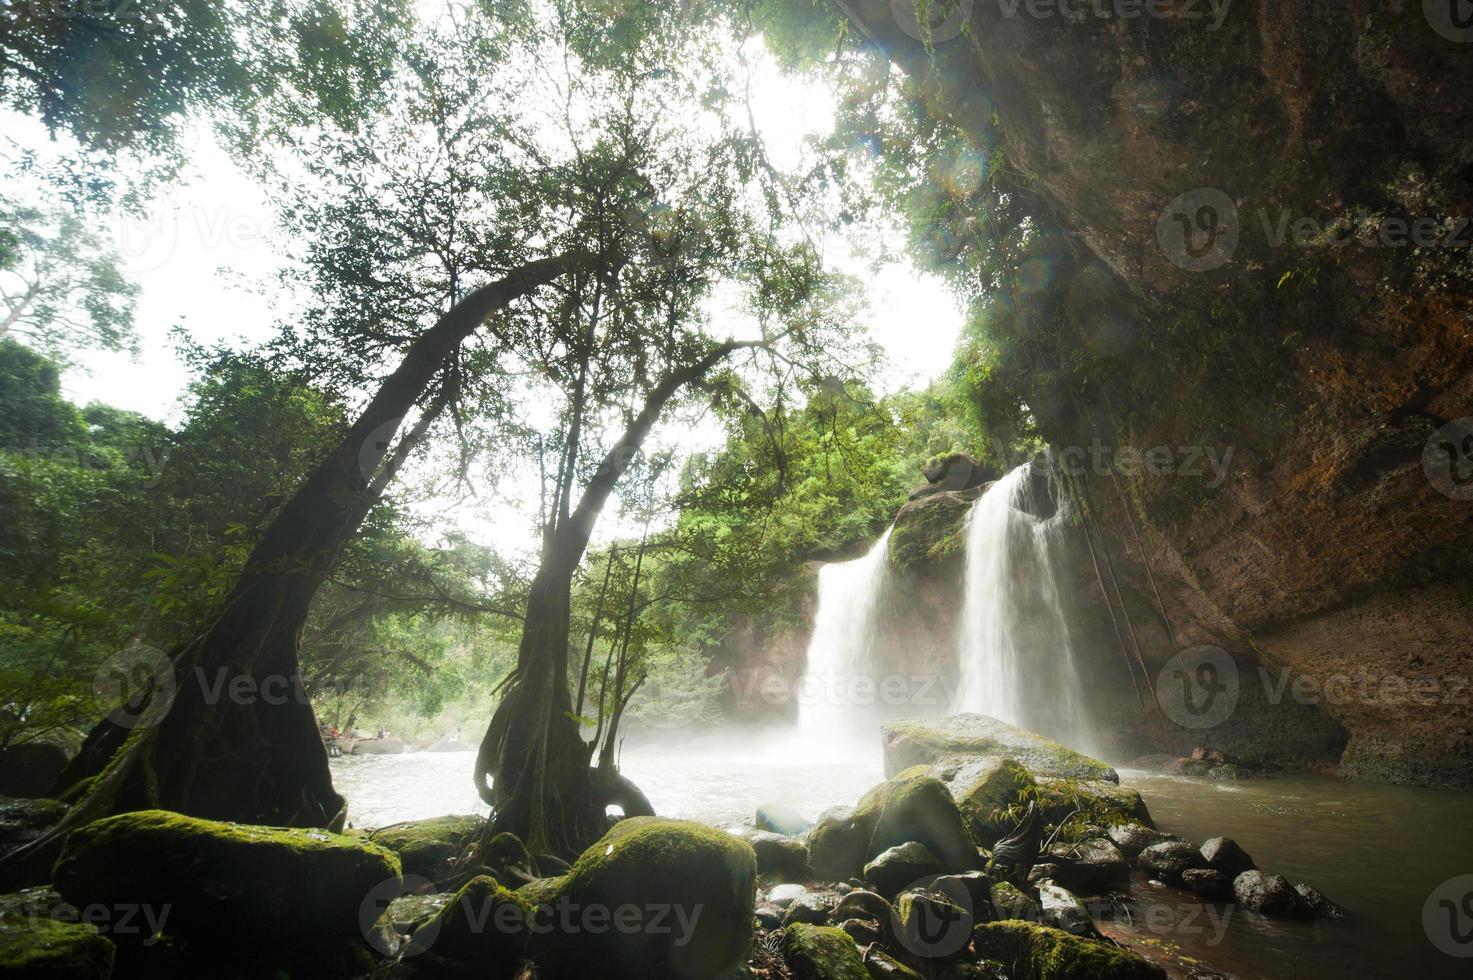 haew suwat waterval in het nationale park van khao yai, thailand. foto